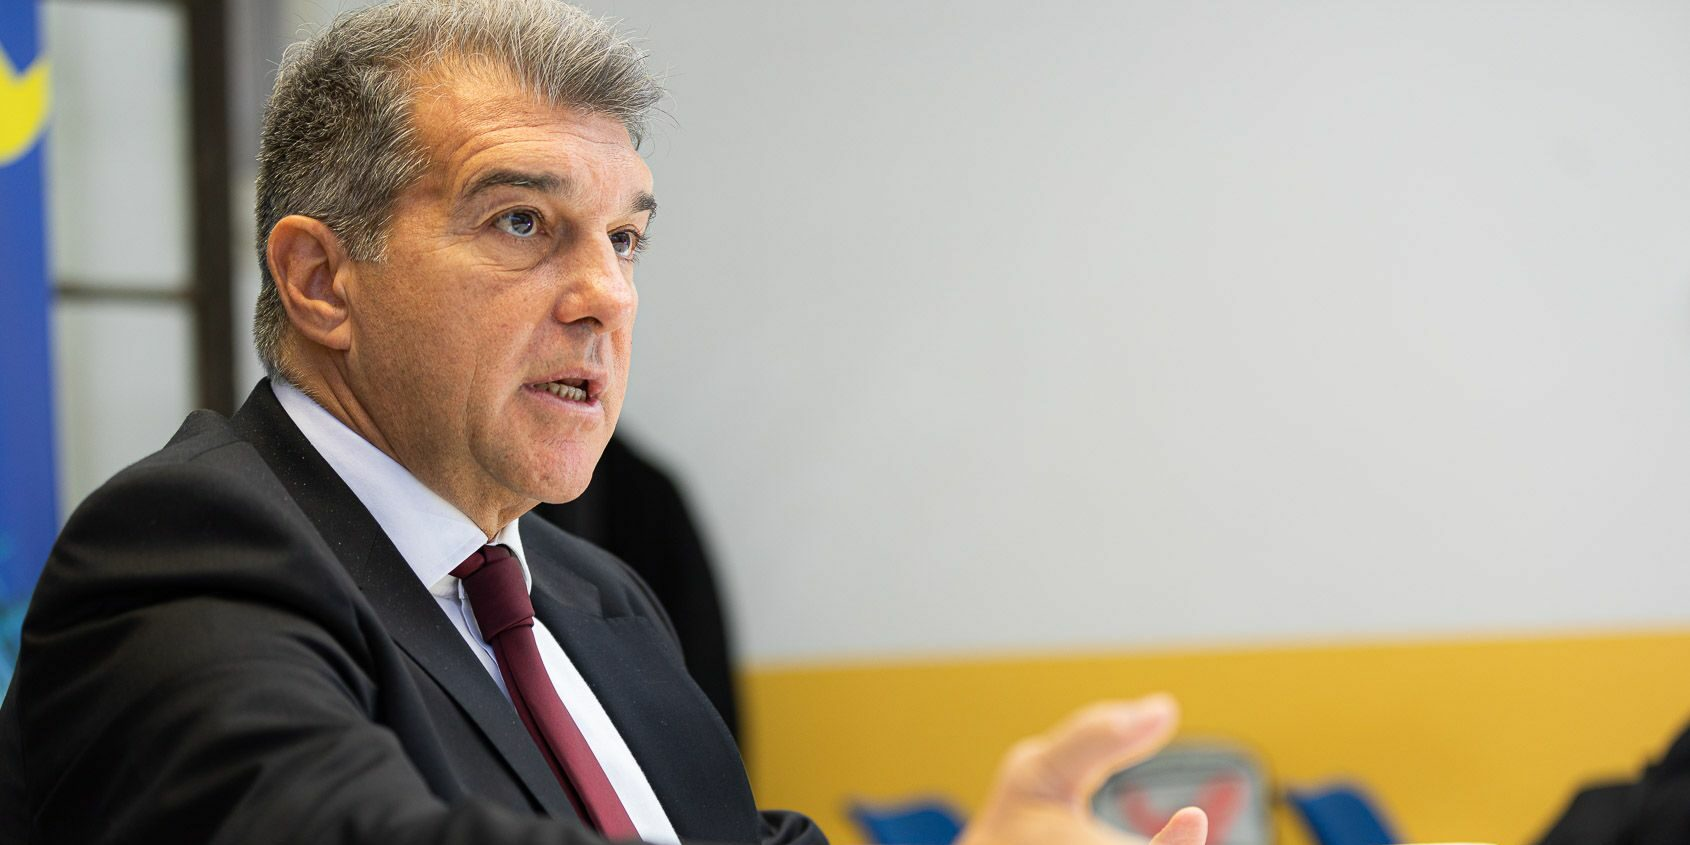 Joan Laporta, president del Barça | Jordi Borràs